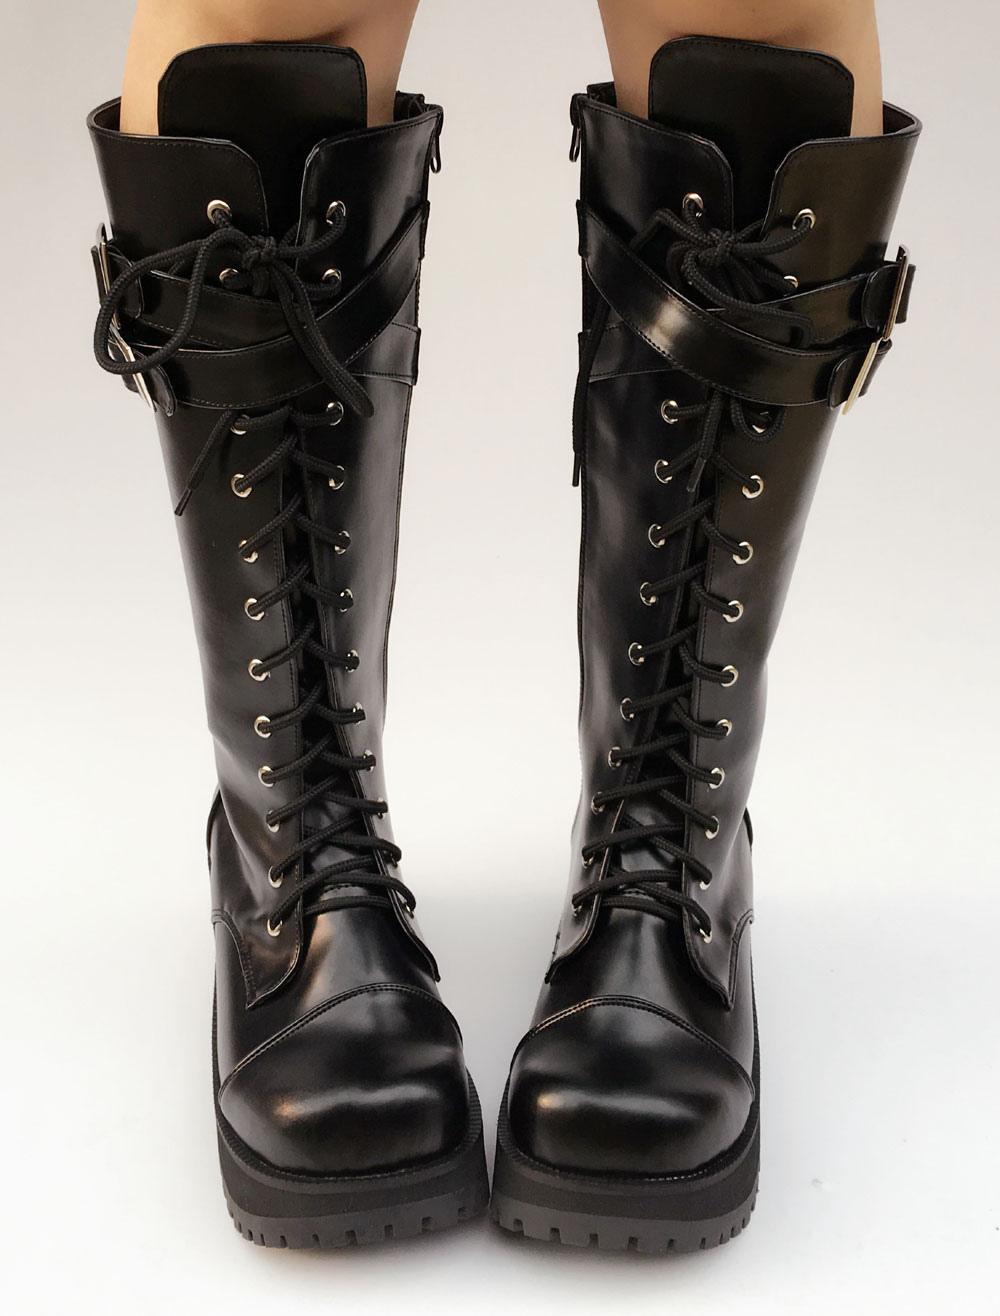 Lolita negro botas de plataforma de tacón grueso alrededor del dedo del pie encaje Lolita corto botas Rwjf1np